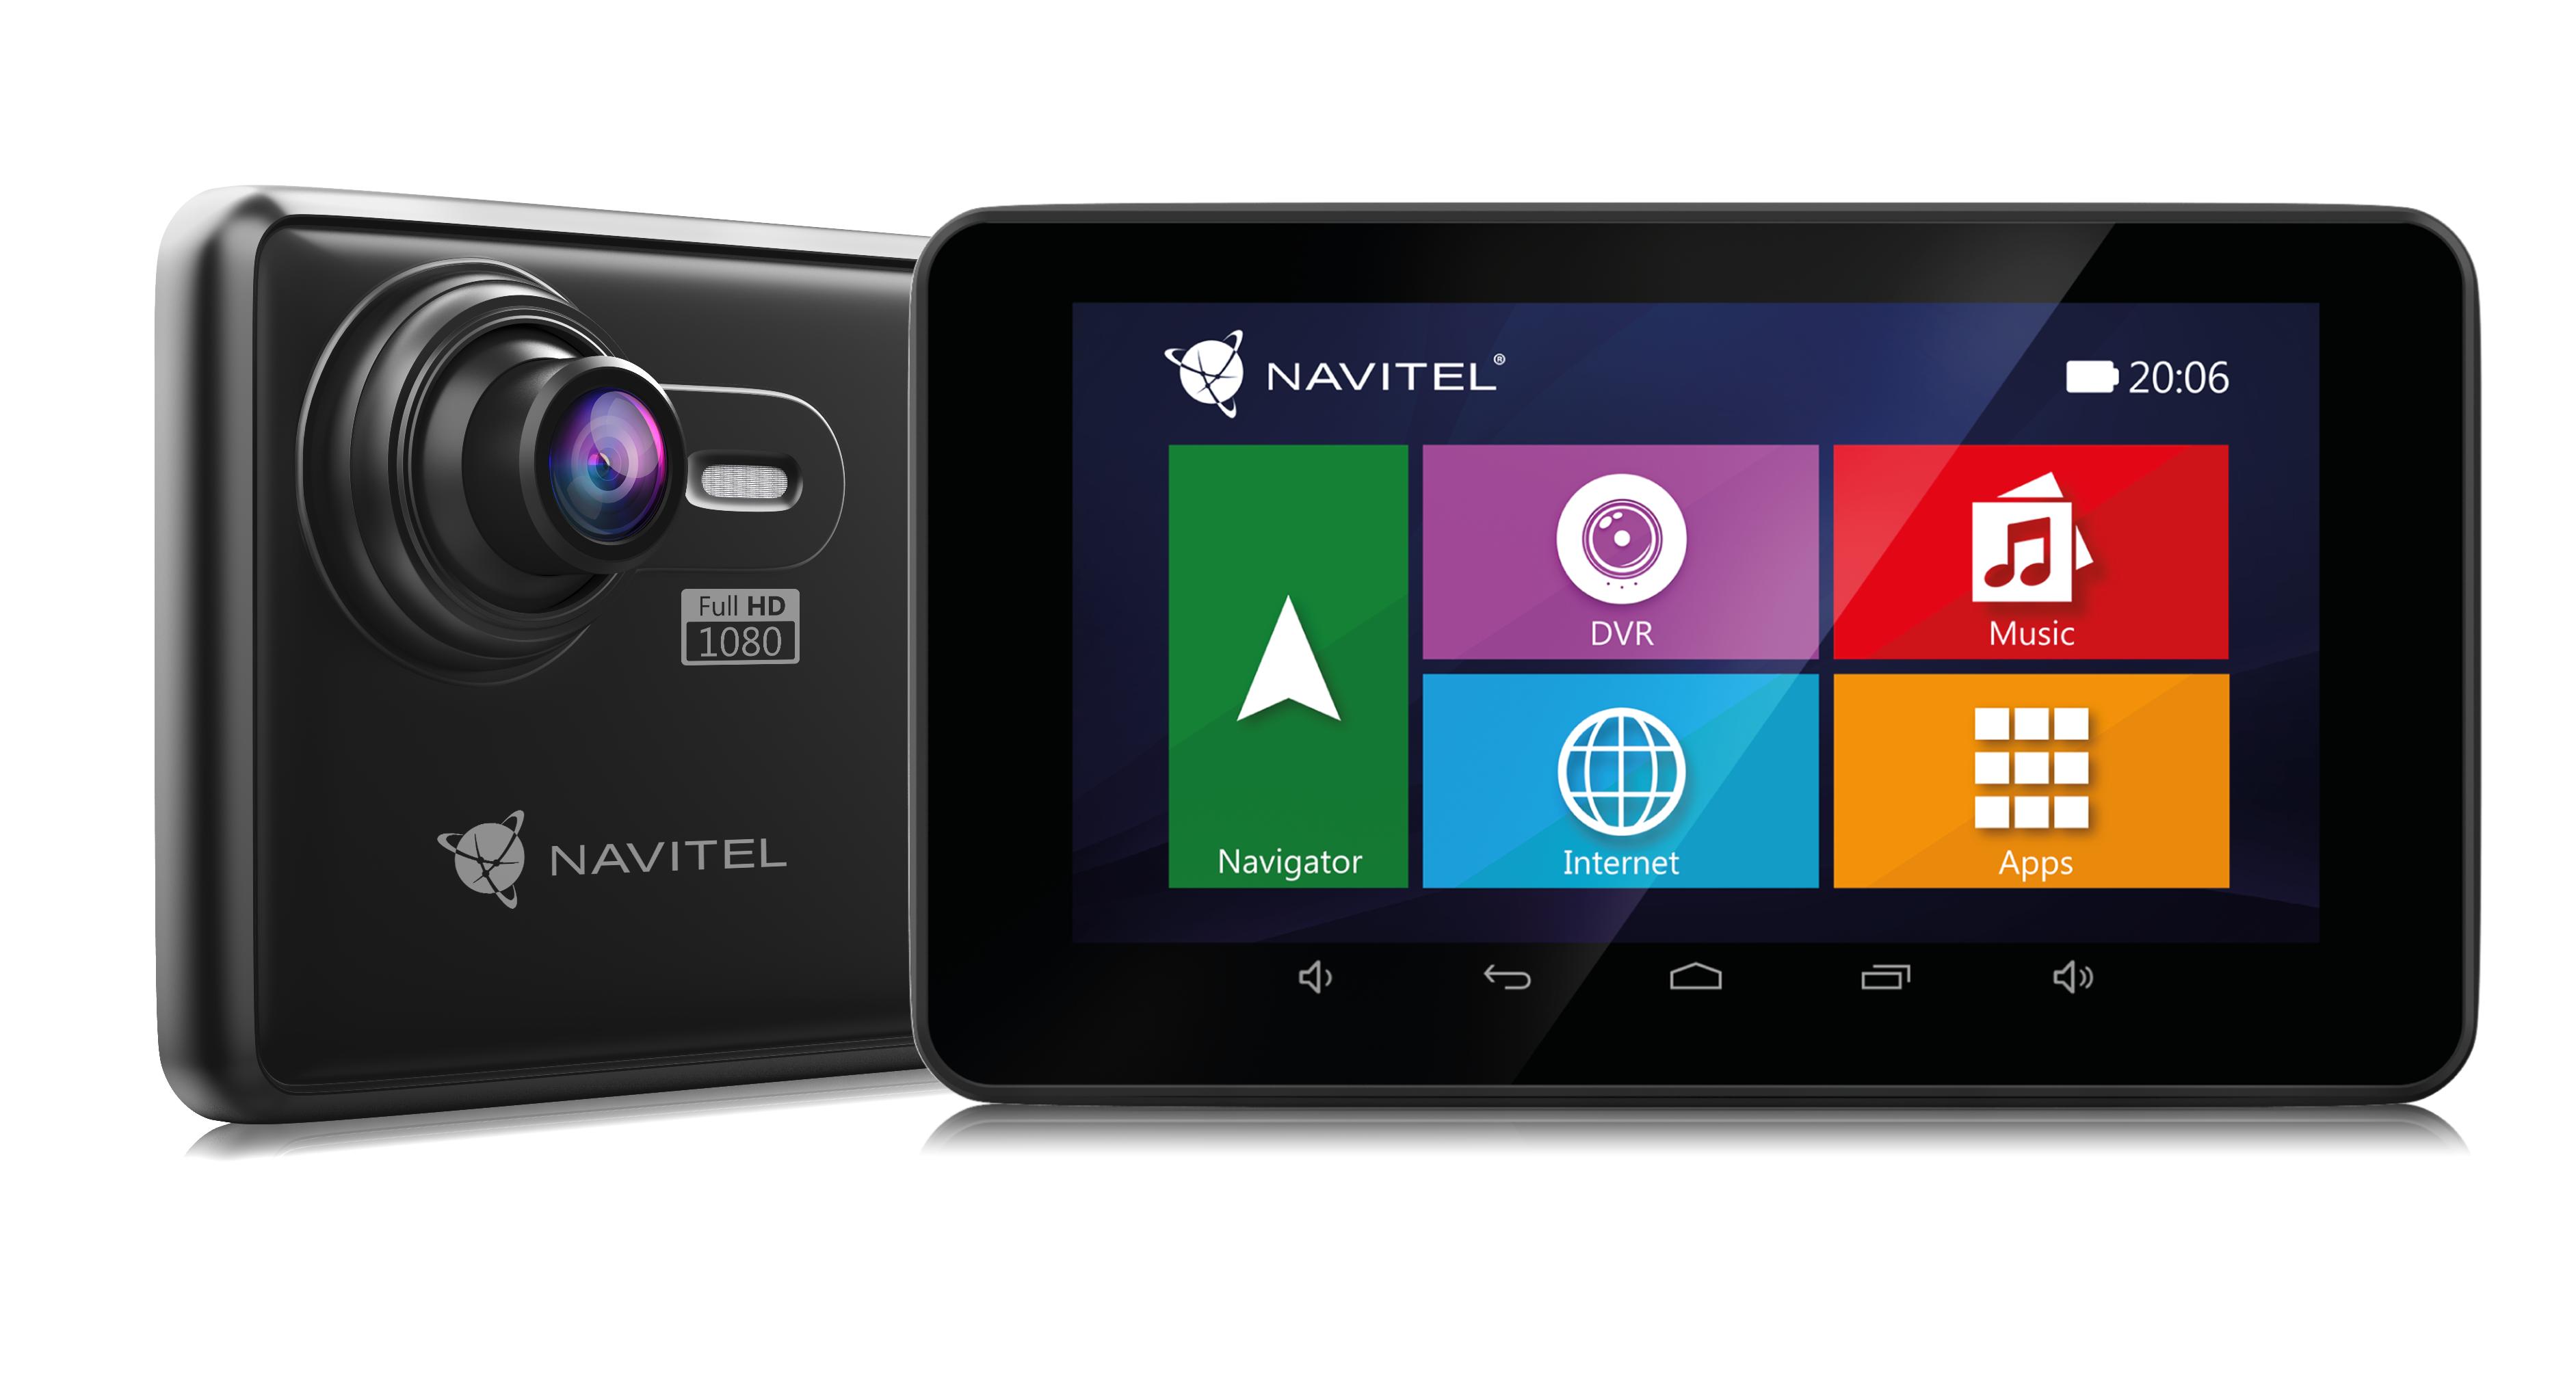 Caméra de bord NAVRE900 NAVITEL NAVRE900 originales de qualité